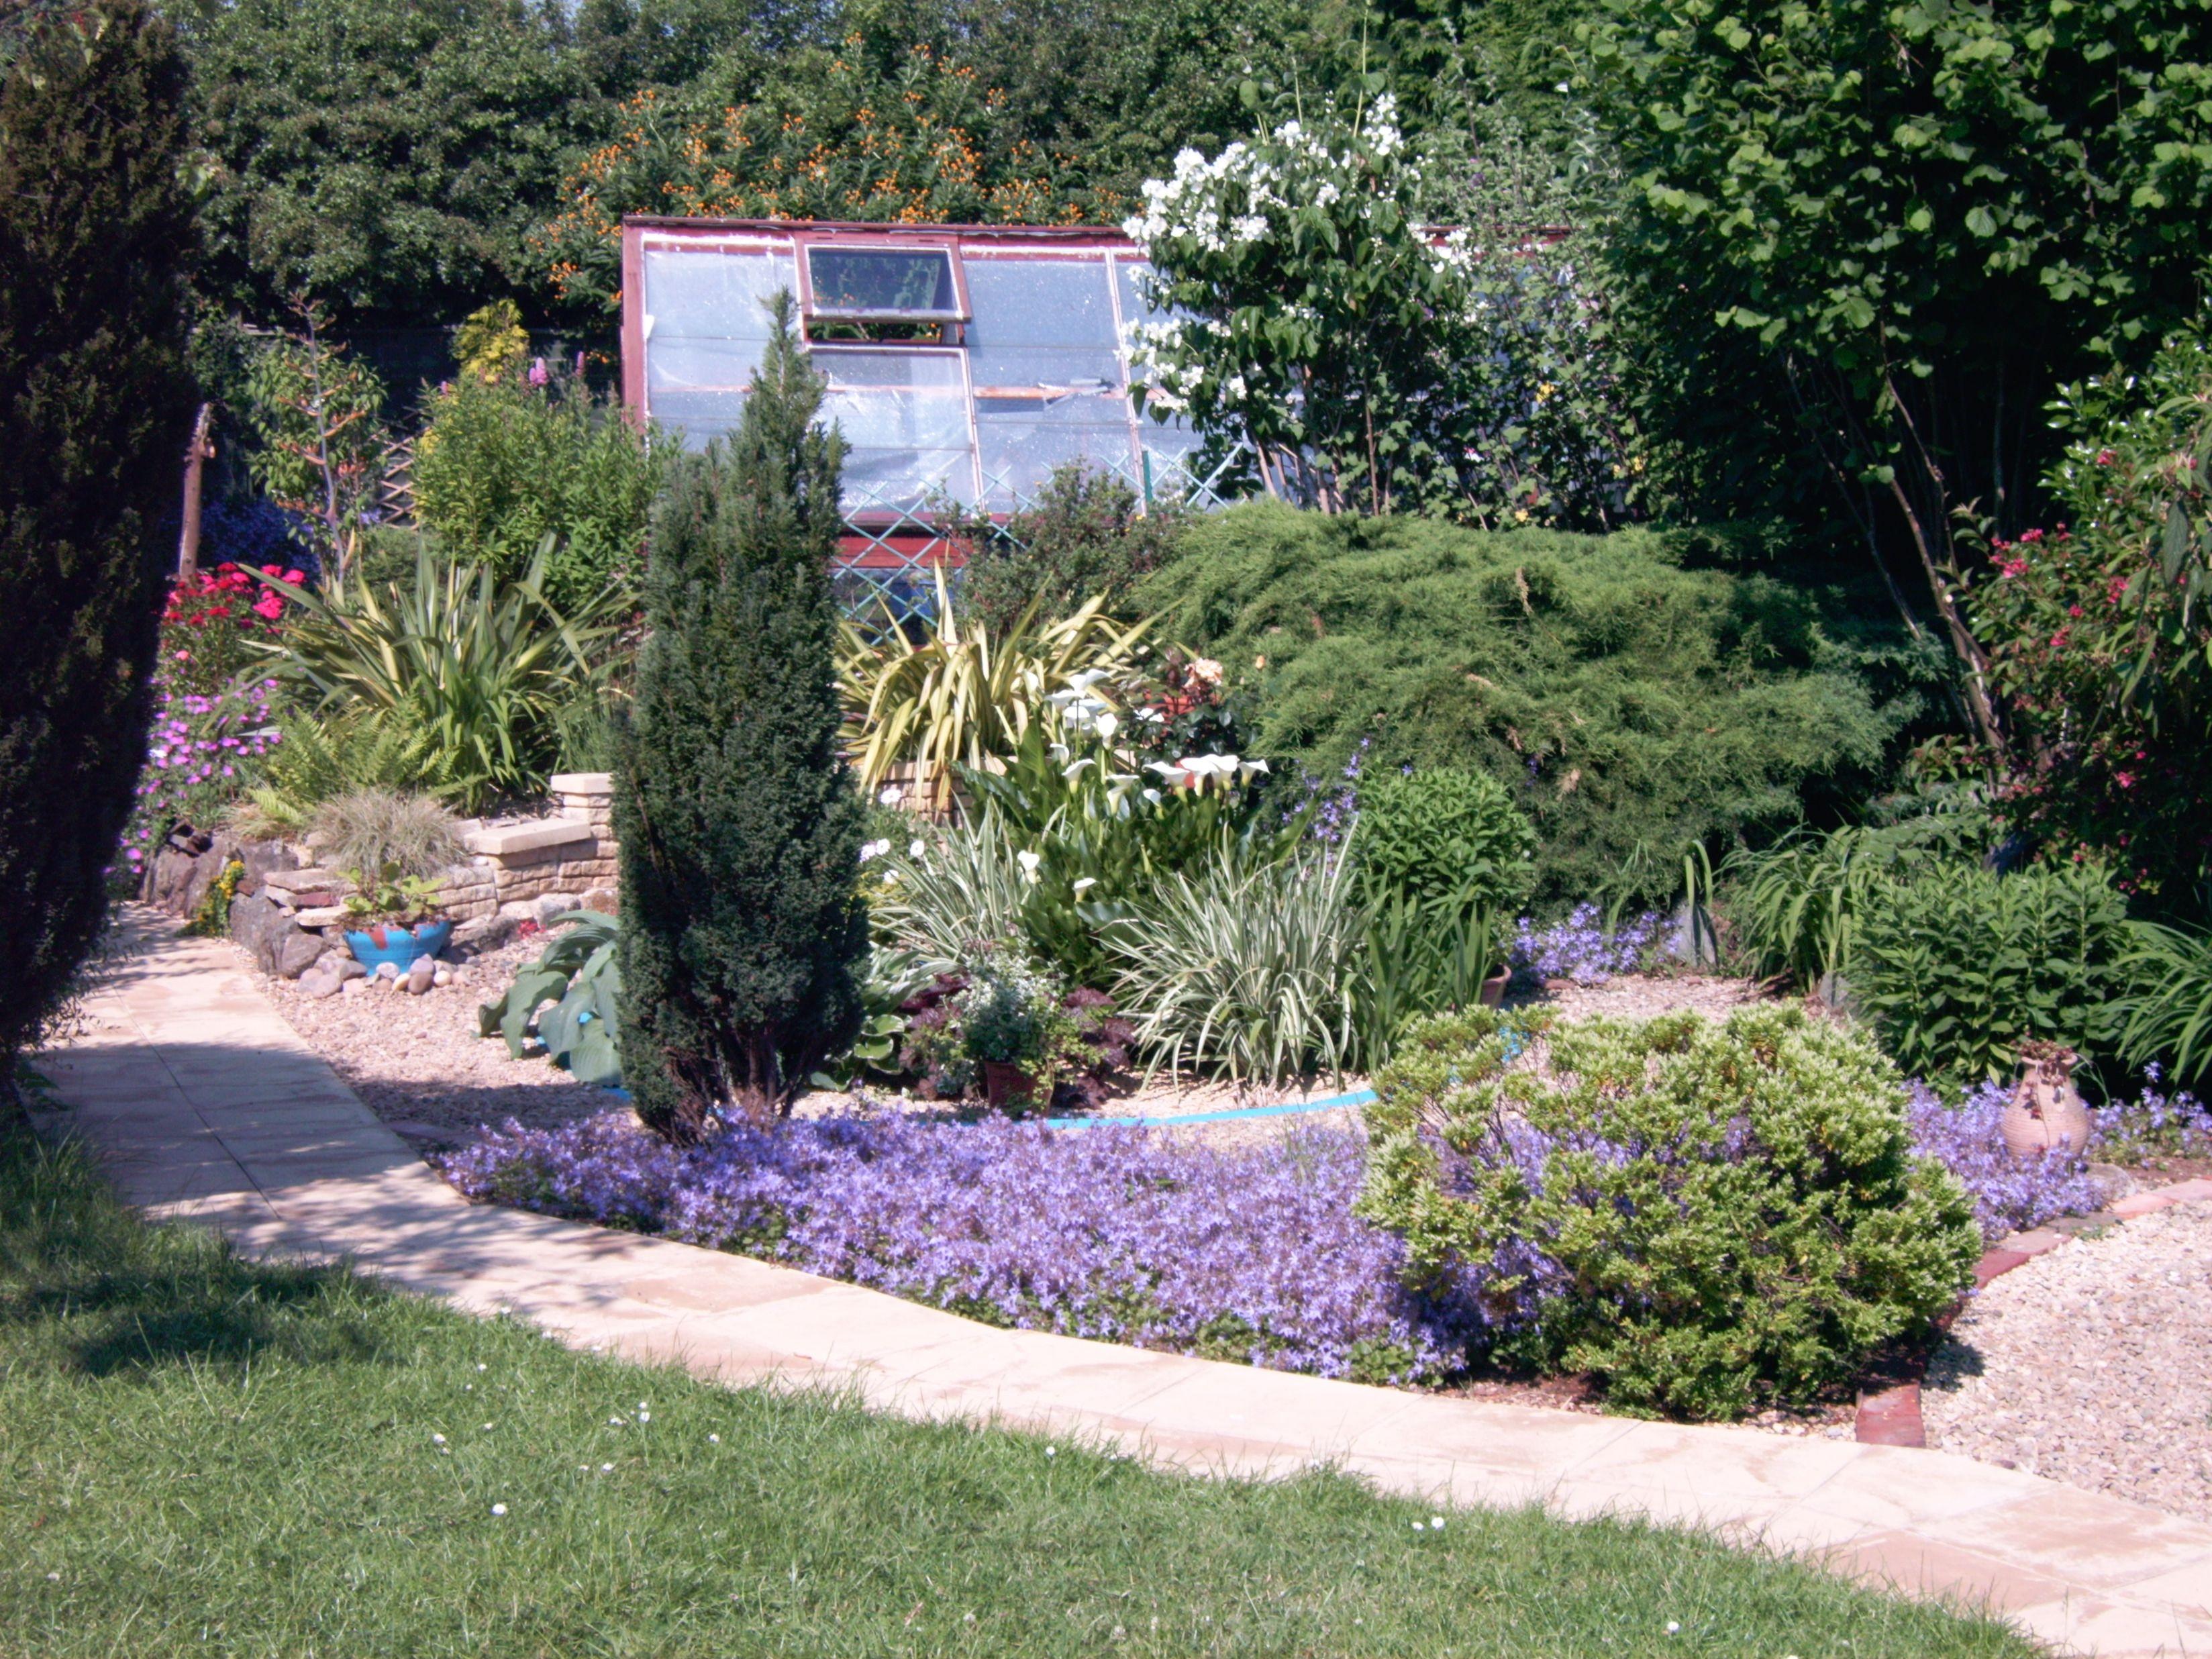 Landscaping diy anti burglar projects use these easy to do safety landscaping diy anti burglar projects use these easy to do safety tricks solutioingenieria Gallery